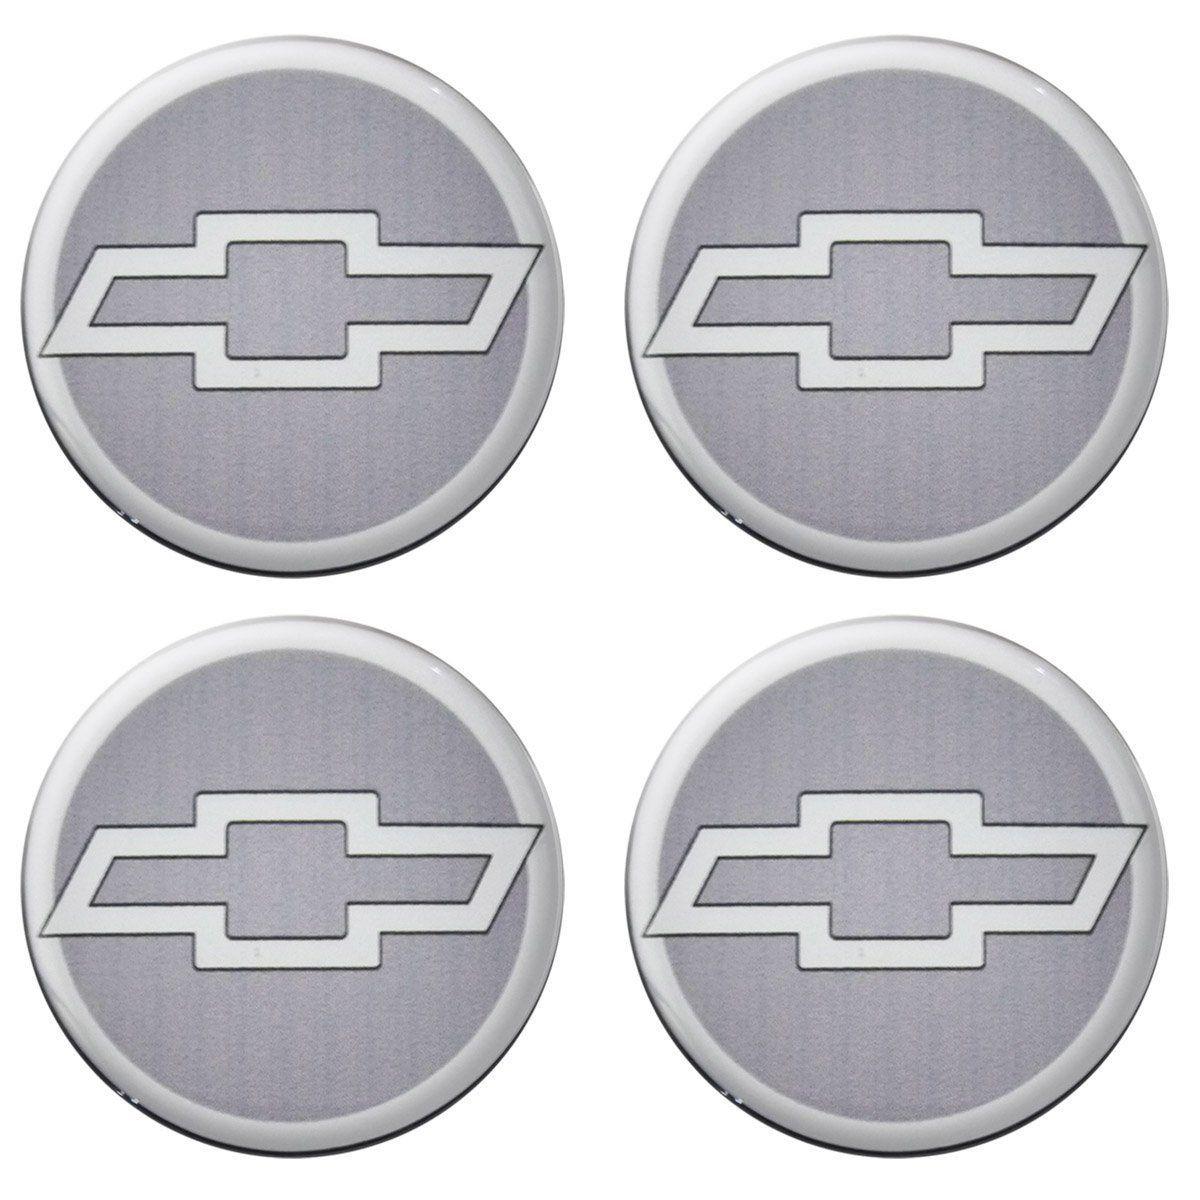 Kit 4 Adesivo Emblema Logo Resinado Calota Gm 55mm - Cinza